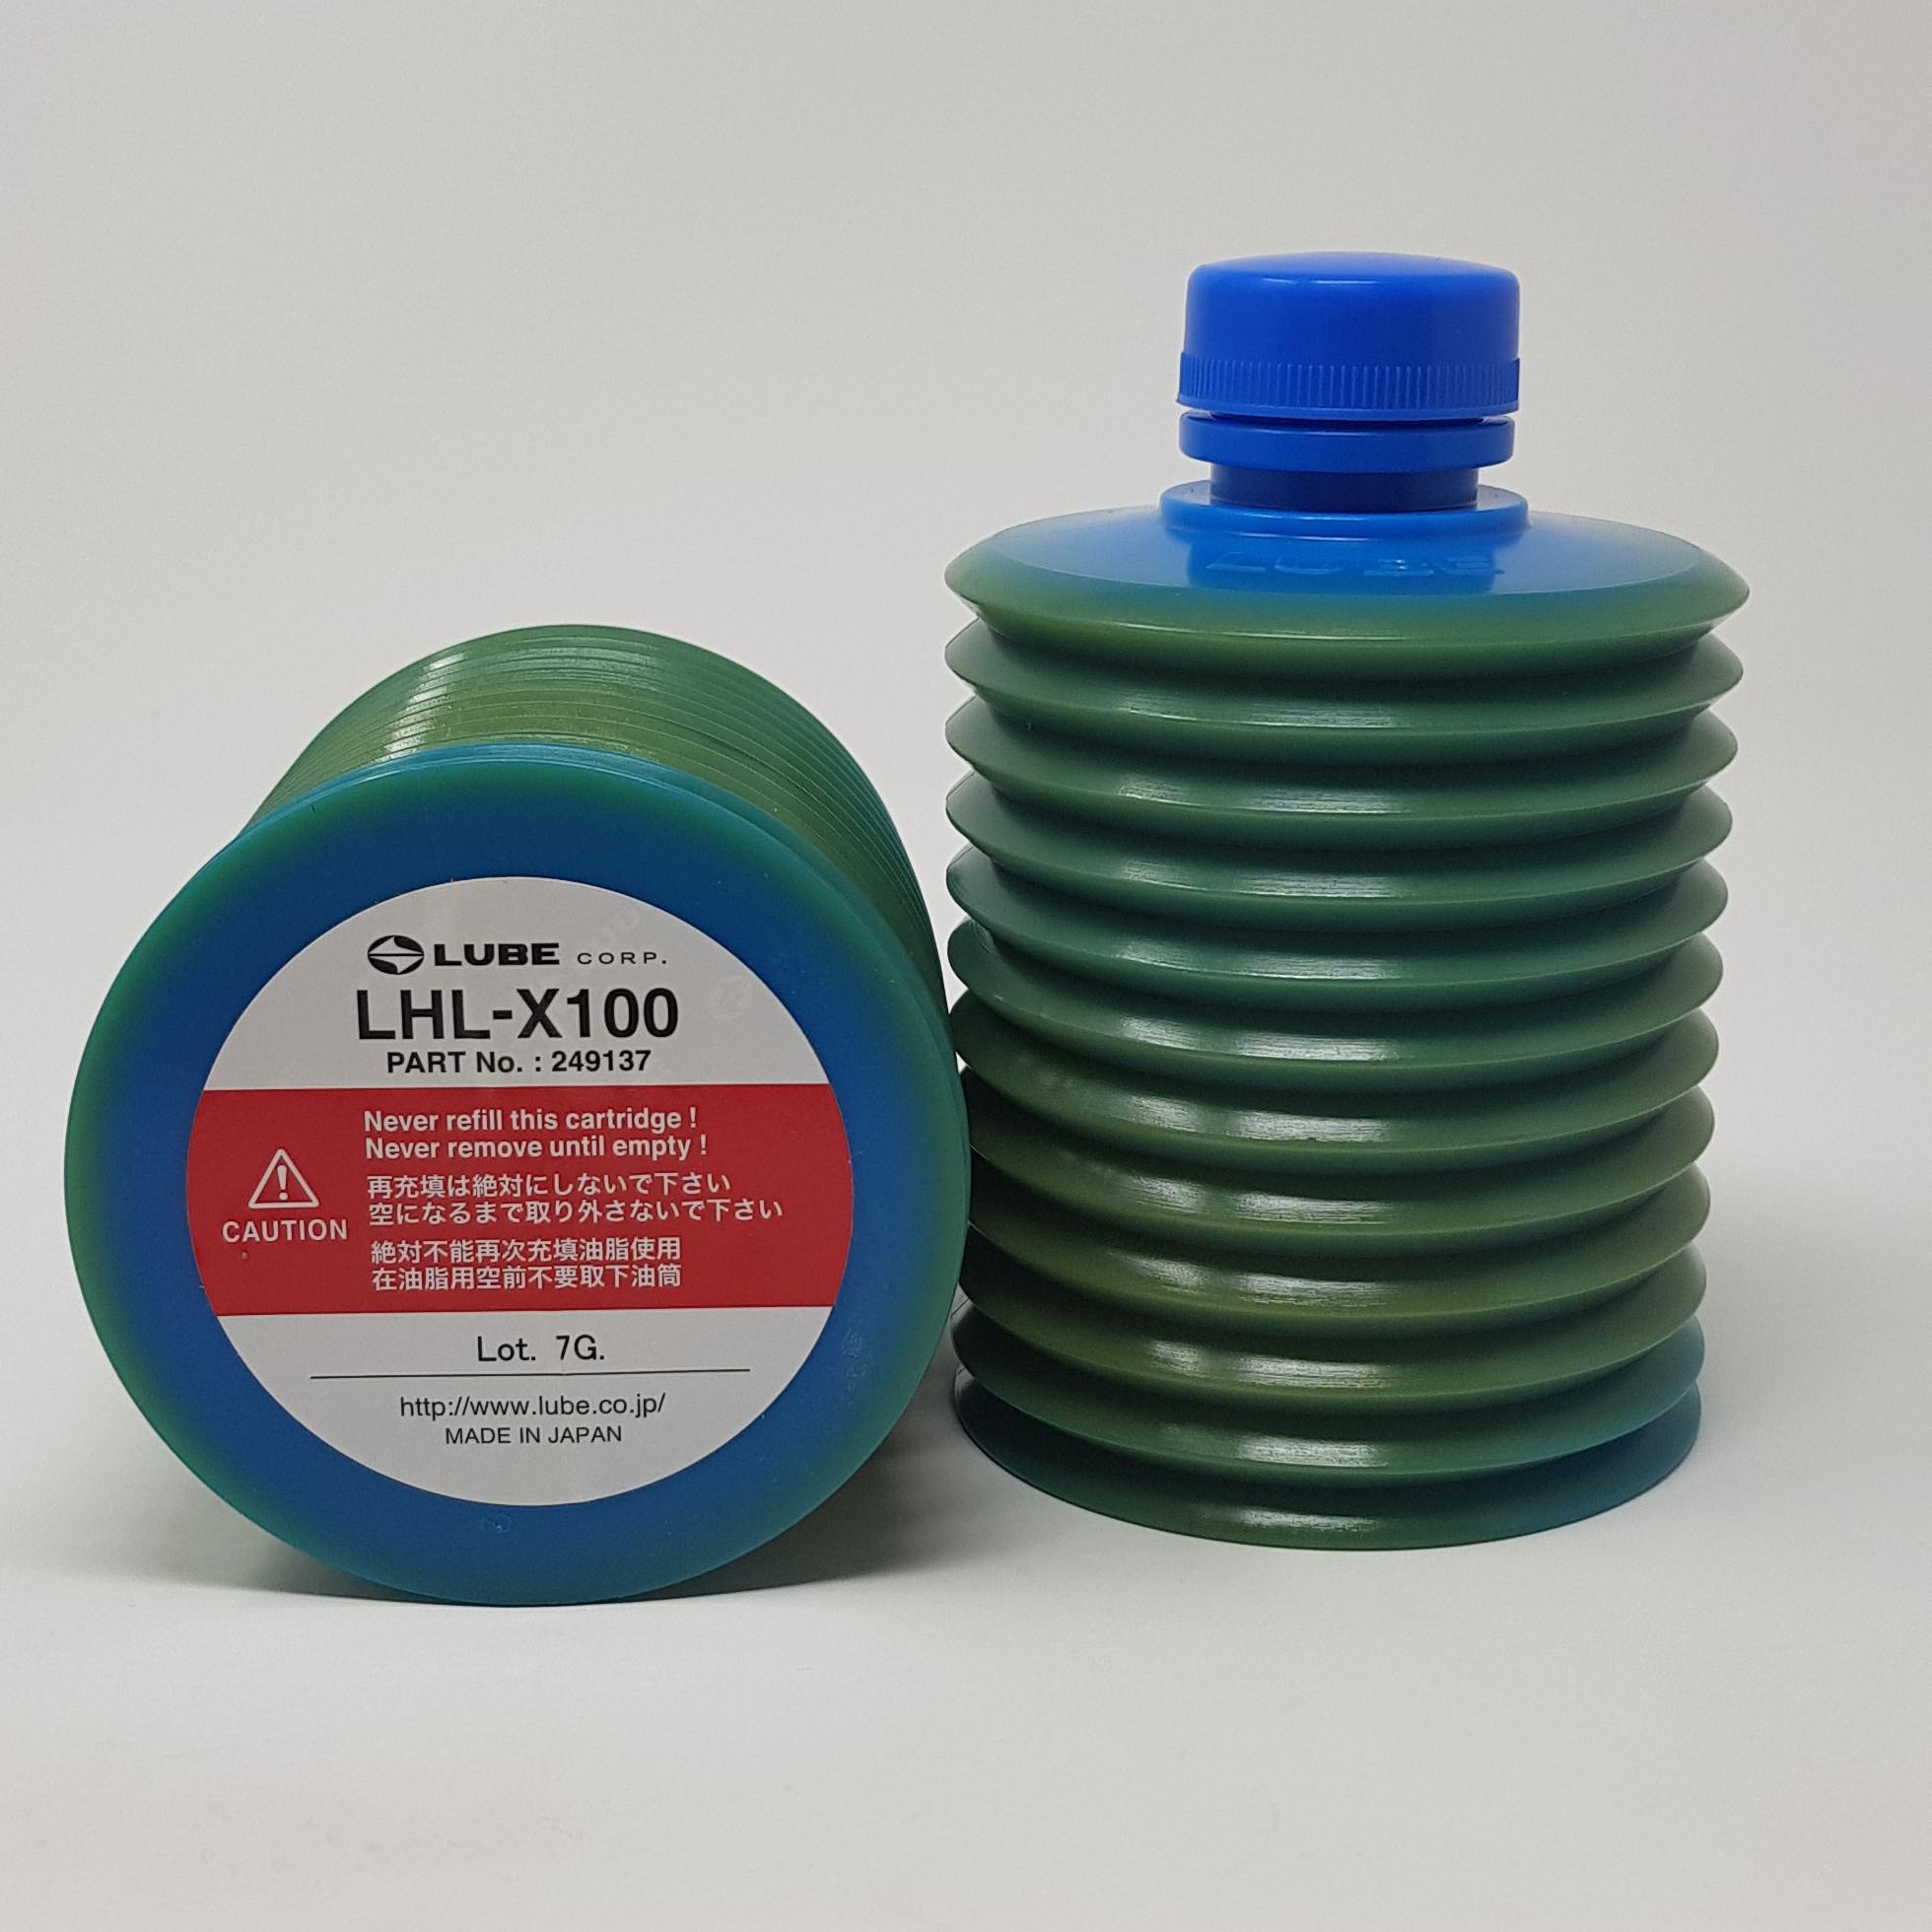 LHL-X100-7 LUBE Grease Cartridge